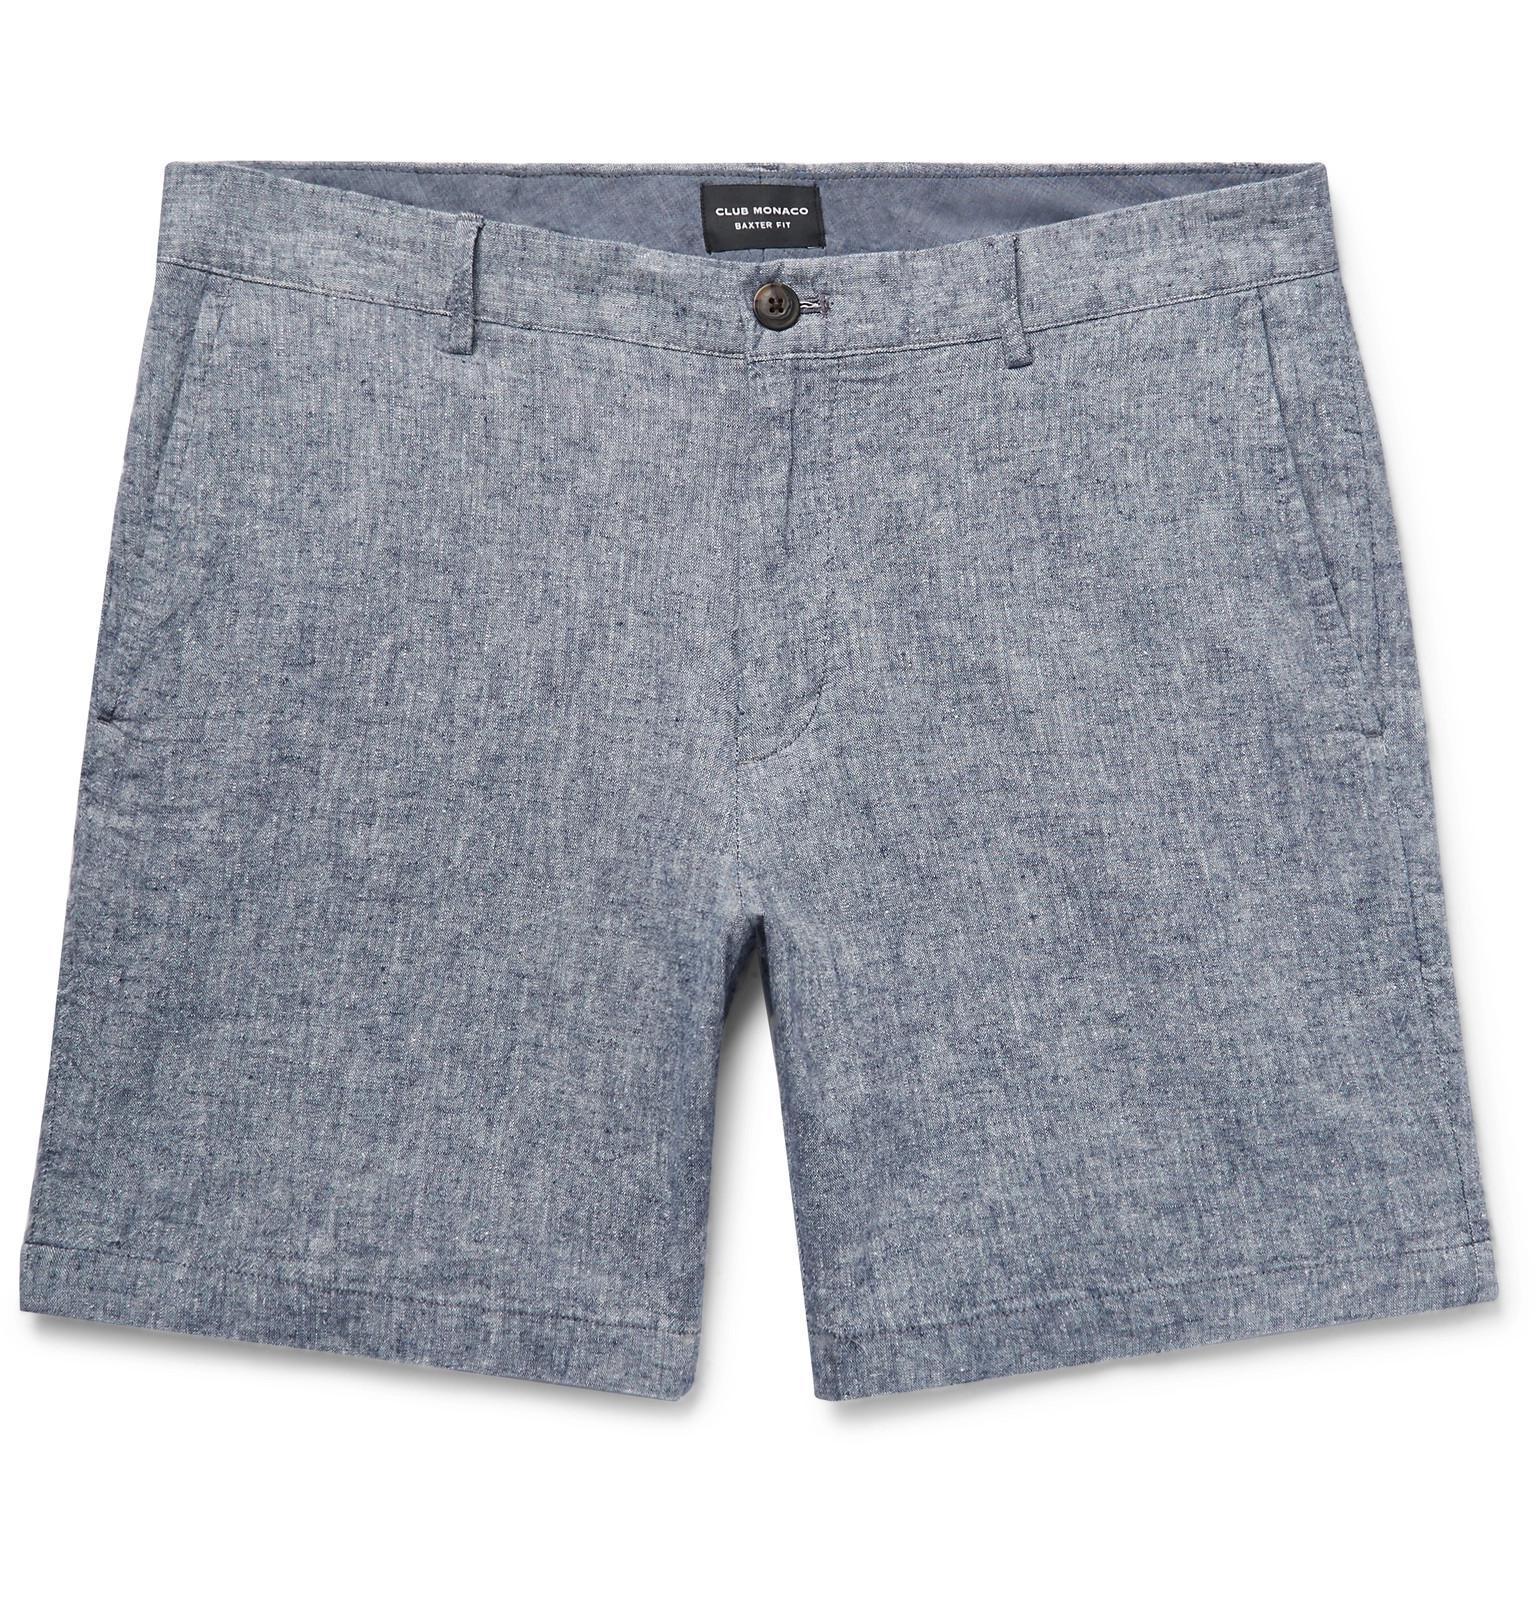 Baxter Slim-fit Stretch-cotton Twill Shorts Club Monaco zcFw5pH